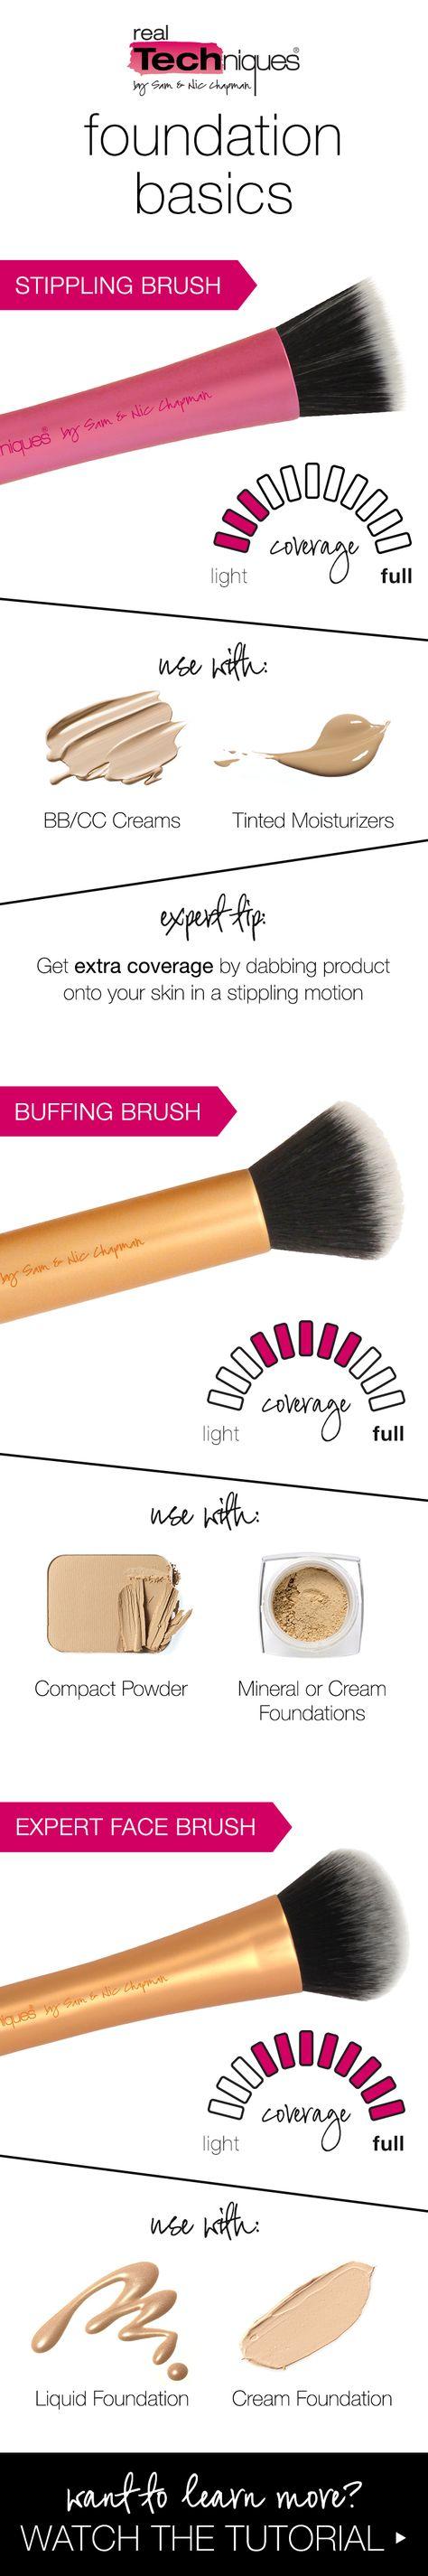 Pinterest: Jocy ♡ Deason - real techniques foundation brush overview - stippling, buffing & expert face brush tips